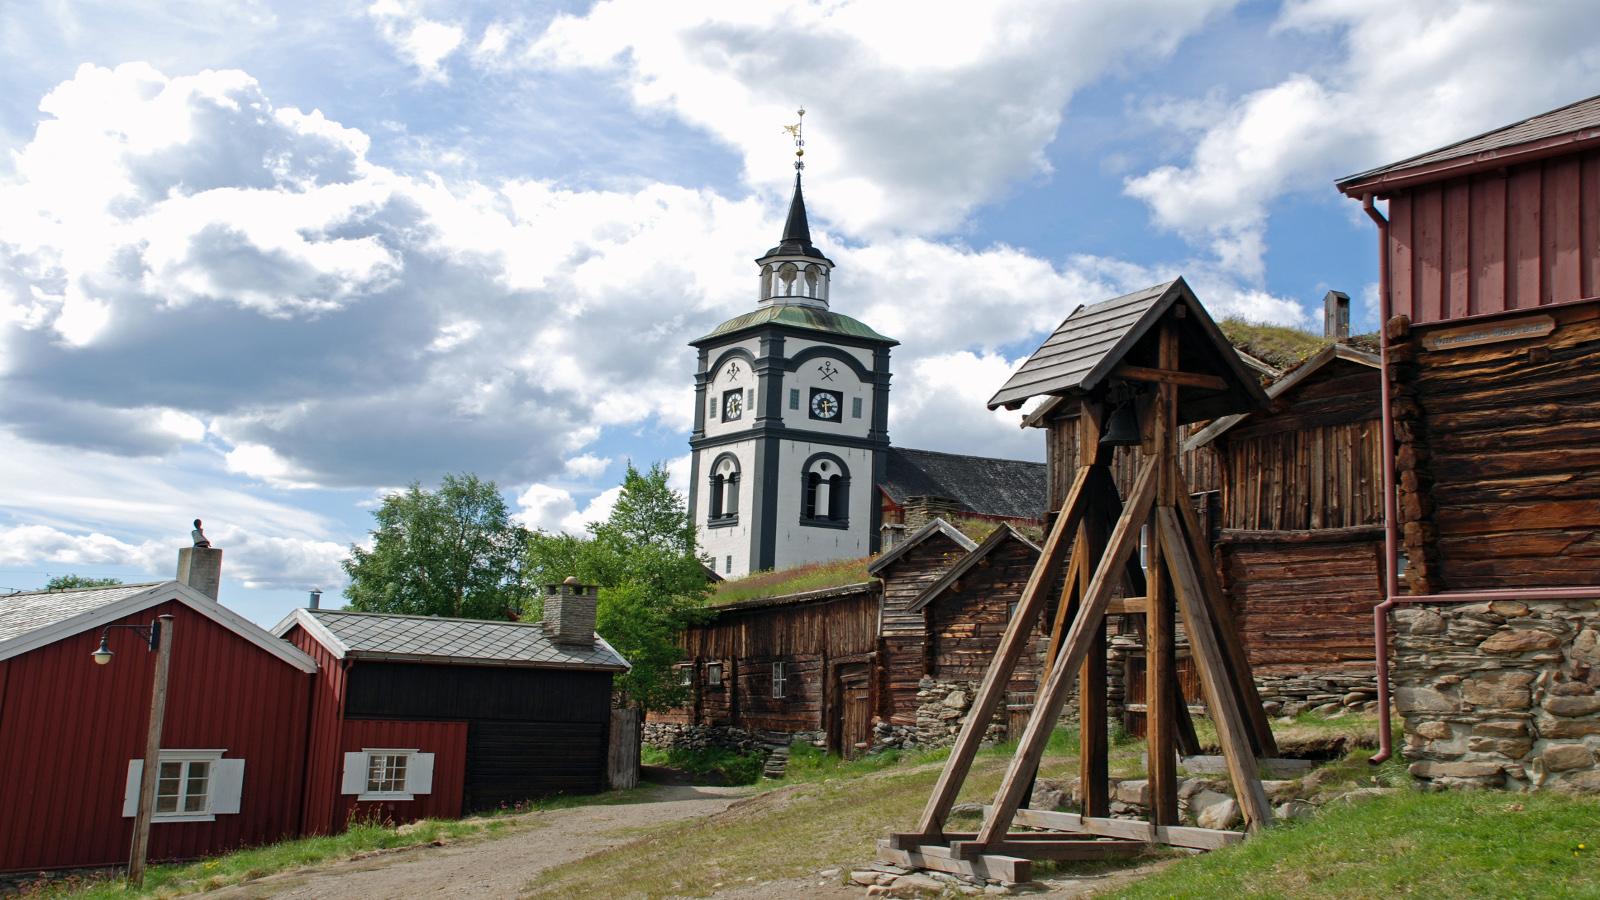 Røros, Trøndelag. Foto: Stig Rimolsrønning / trondelag.com